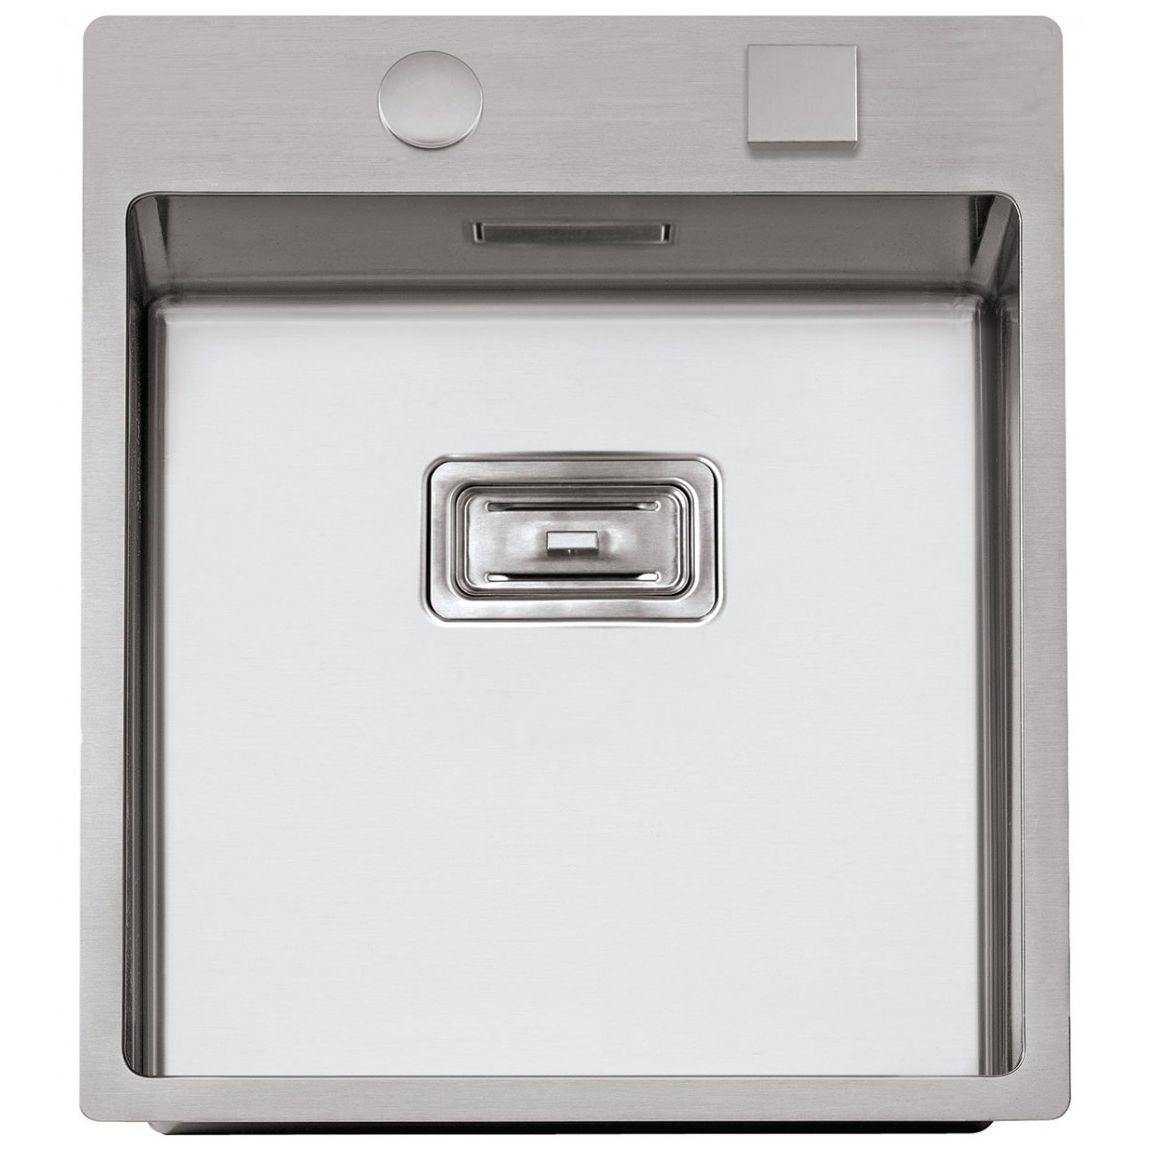 Spüle / 1 Becken / Edelstahl - BOX LUX 46 - RODI - Sinks